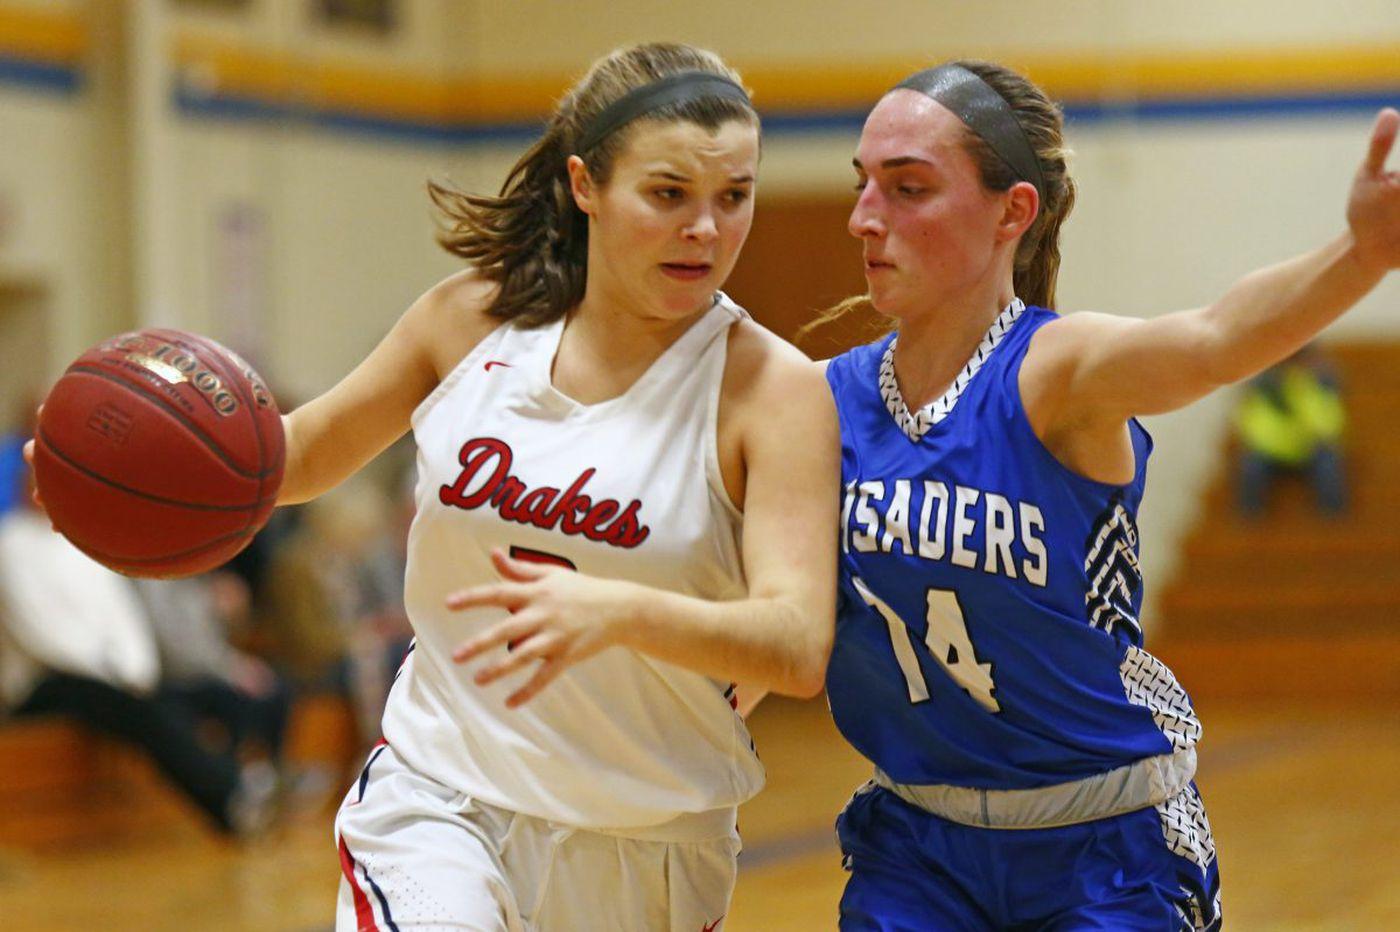 Southeastern Pennsylvania girls' basketball leaders